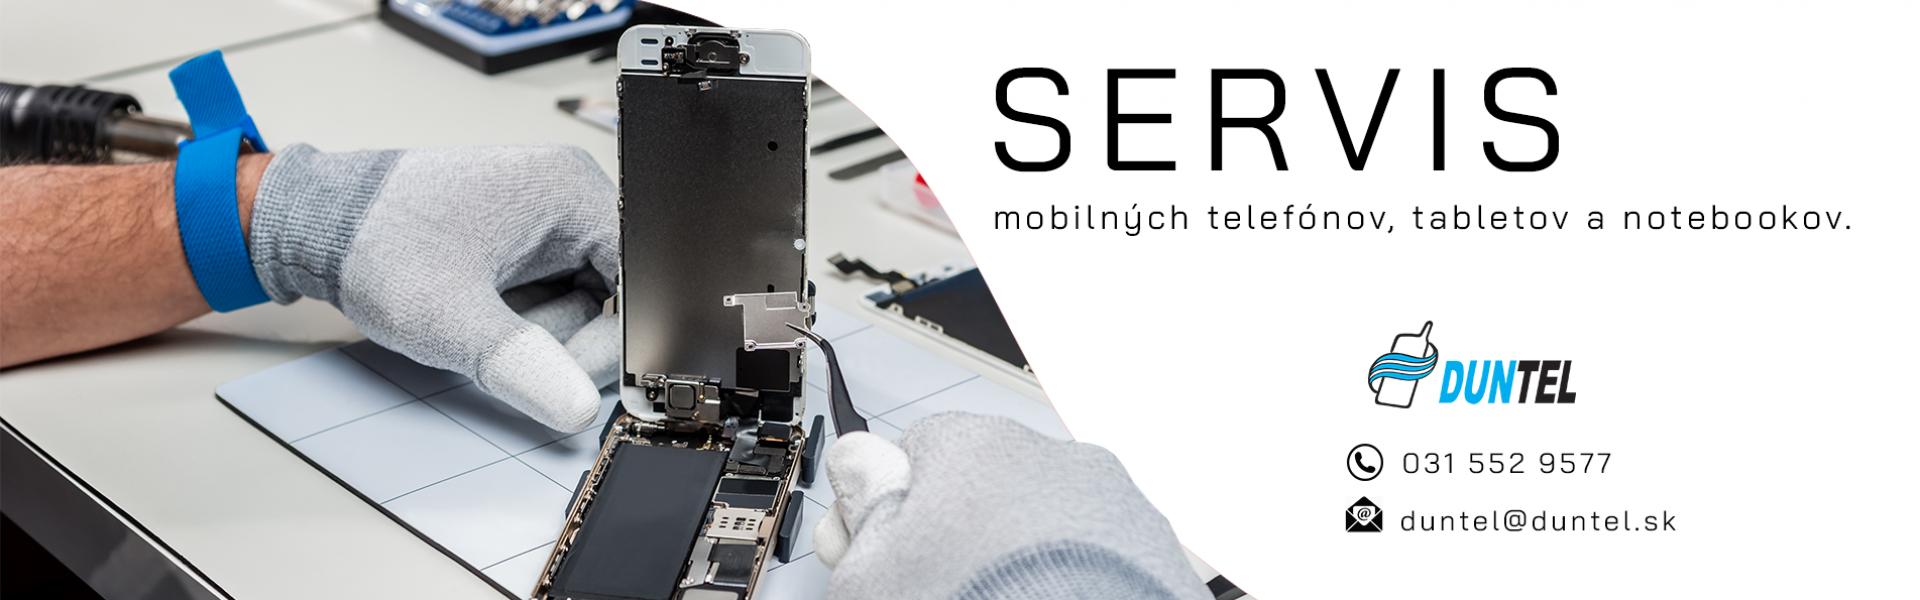 Servis - Servis Web Banner - Duntel